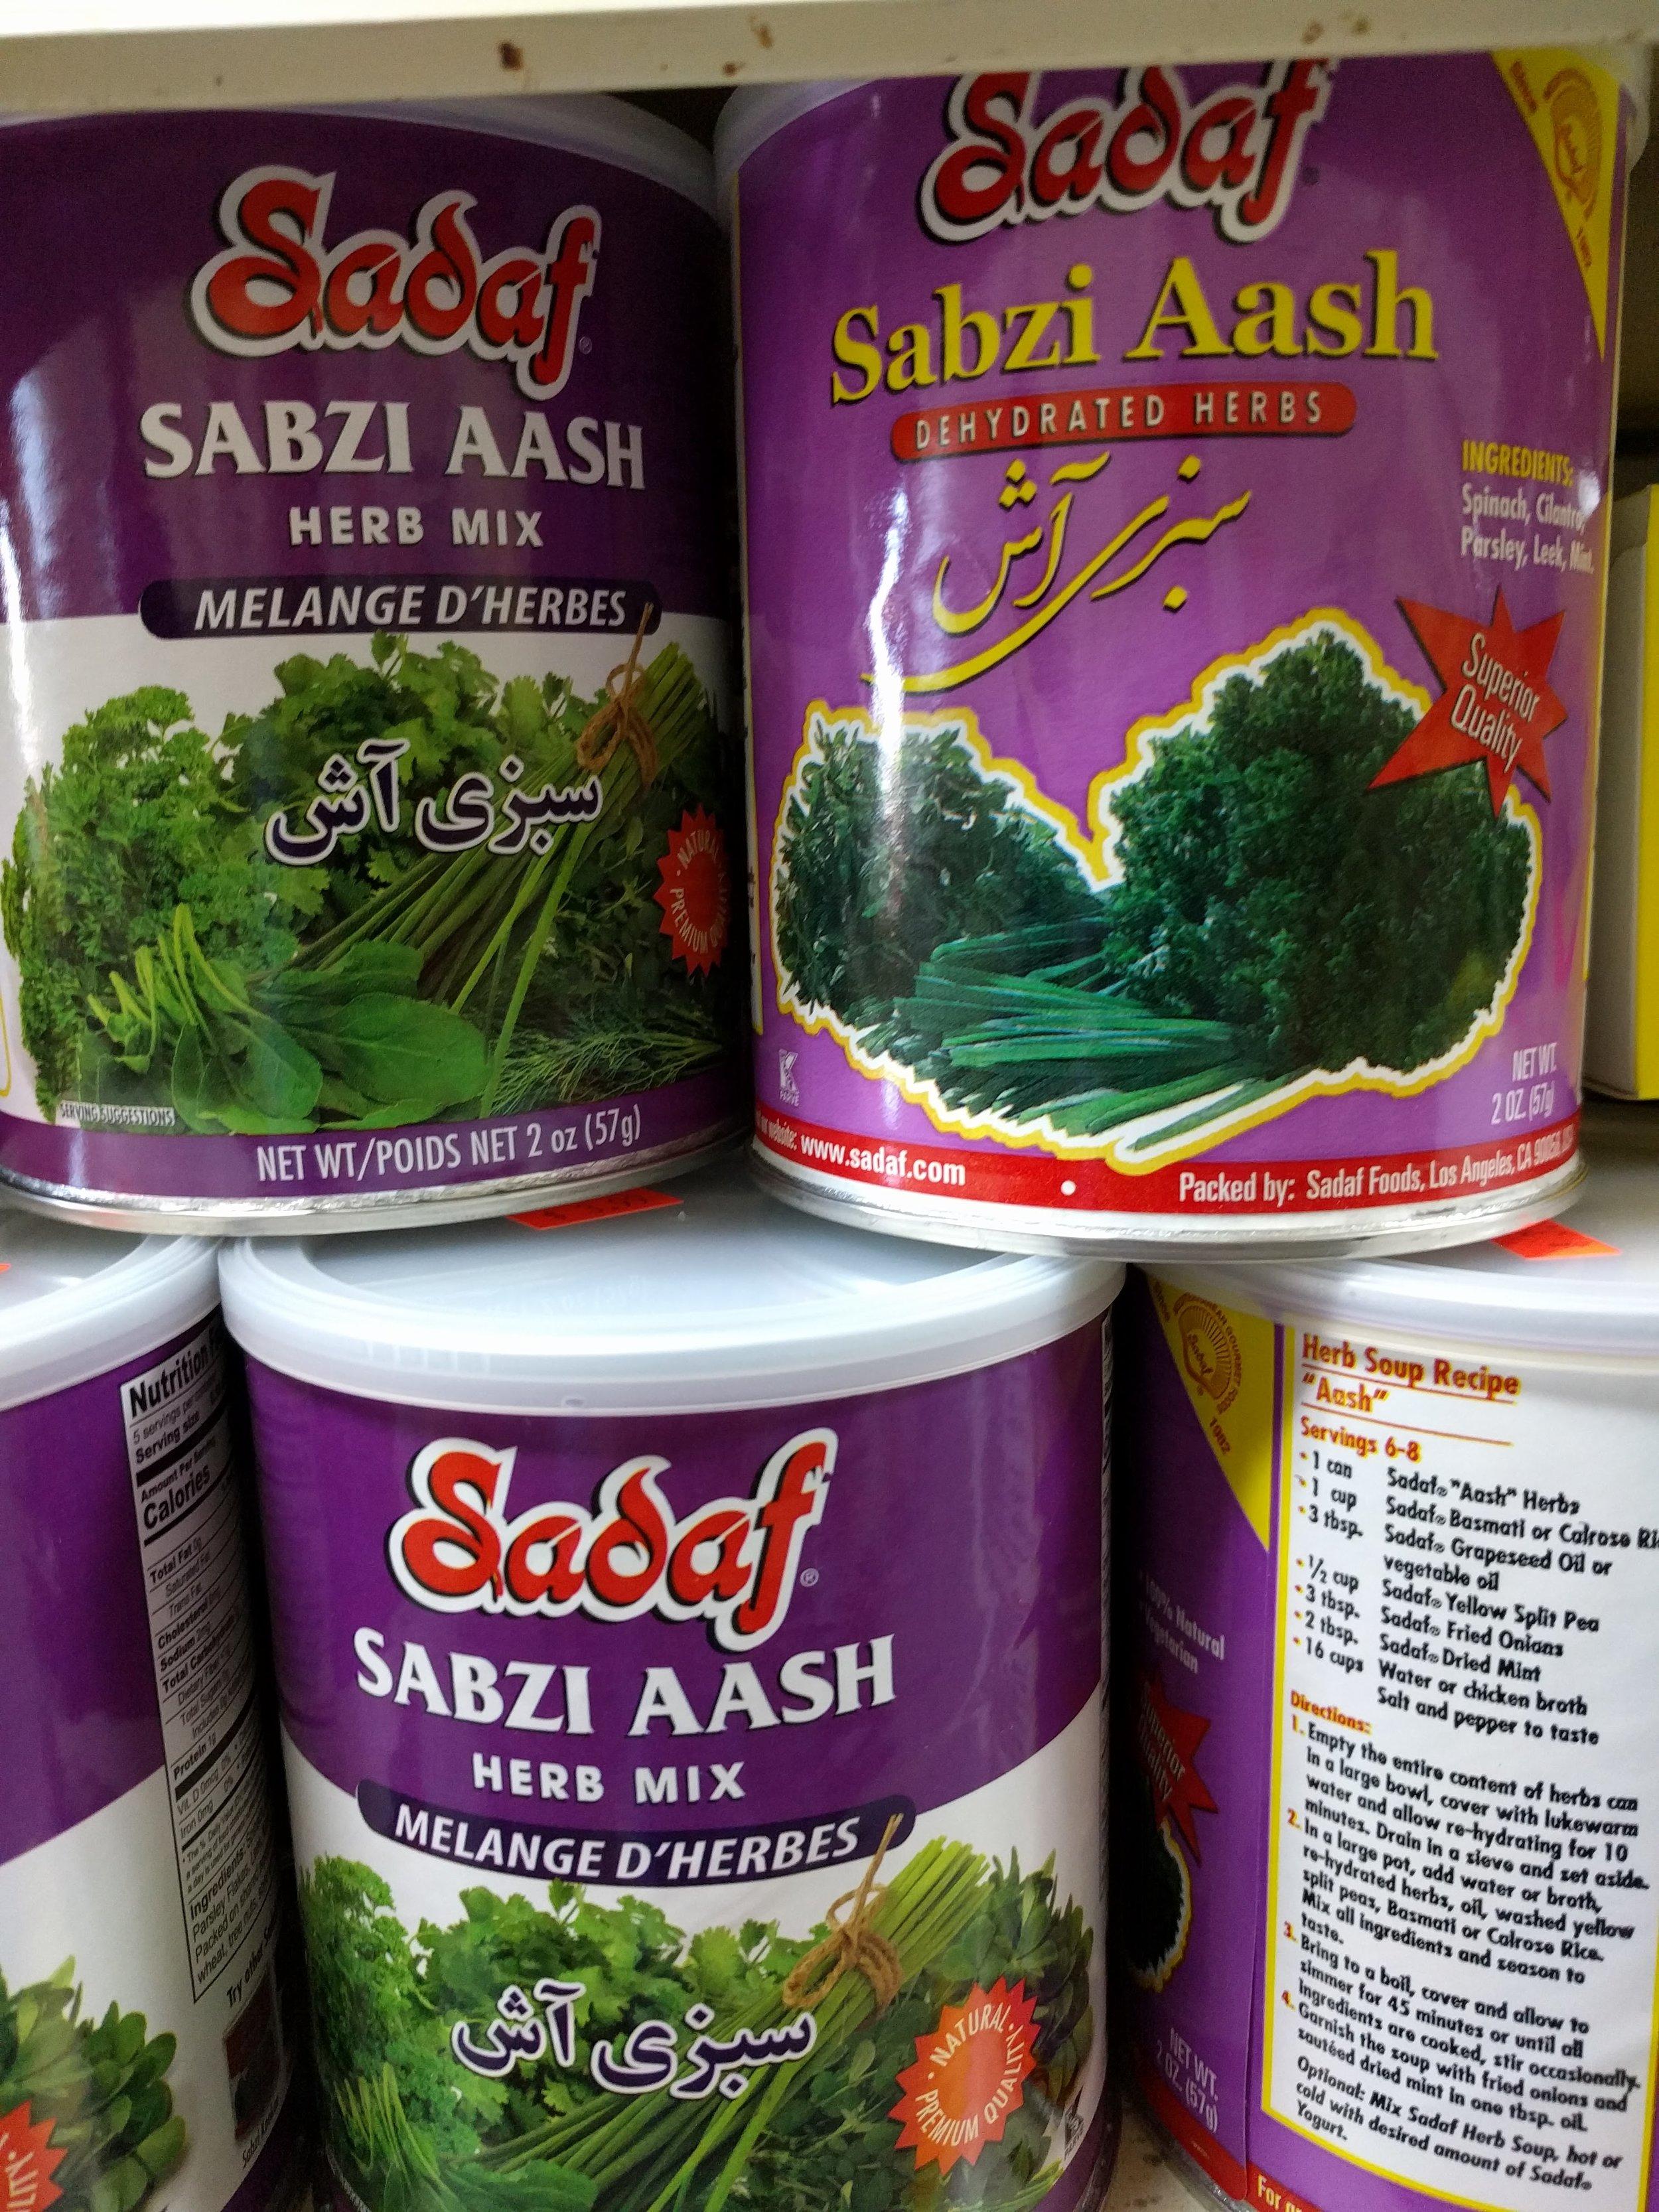 Sadaf-herb-mix-Pak-Halal-International-Foods-12259-W-87th-St-Pkwy-Lenexa-KS-66215-3.jpg